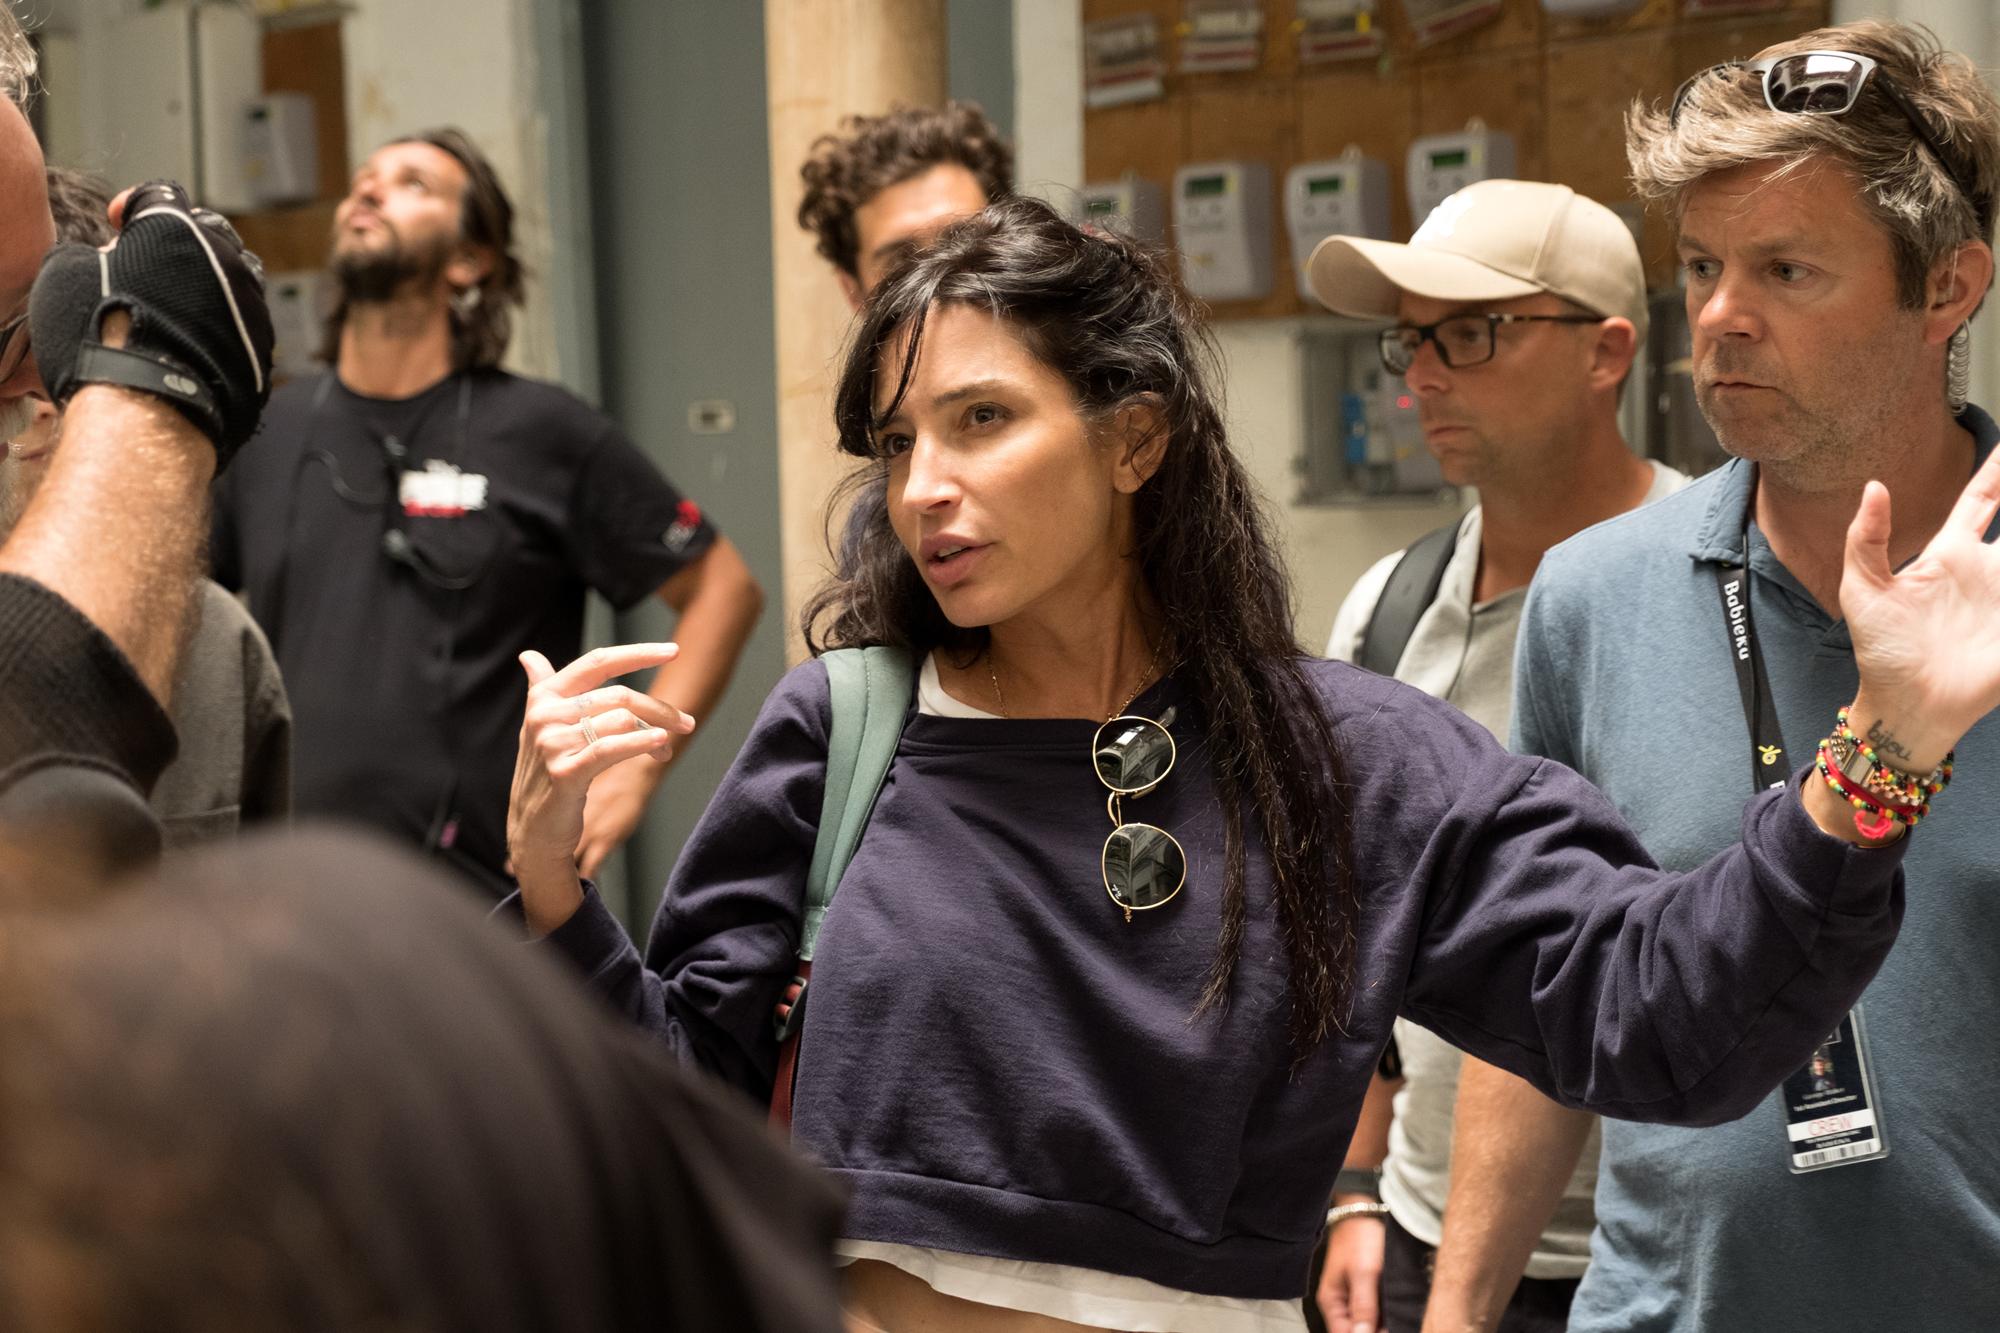 Director Reed Morano